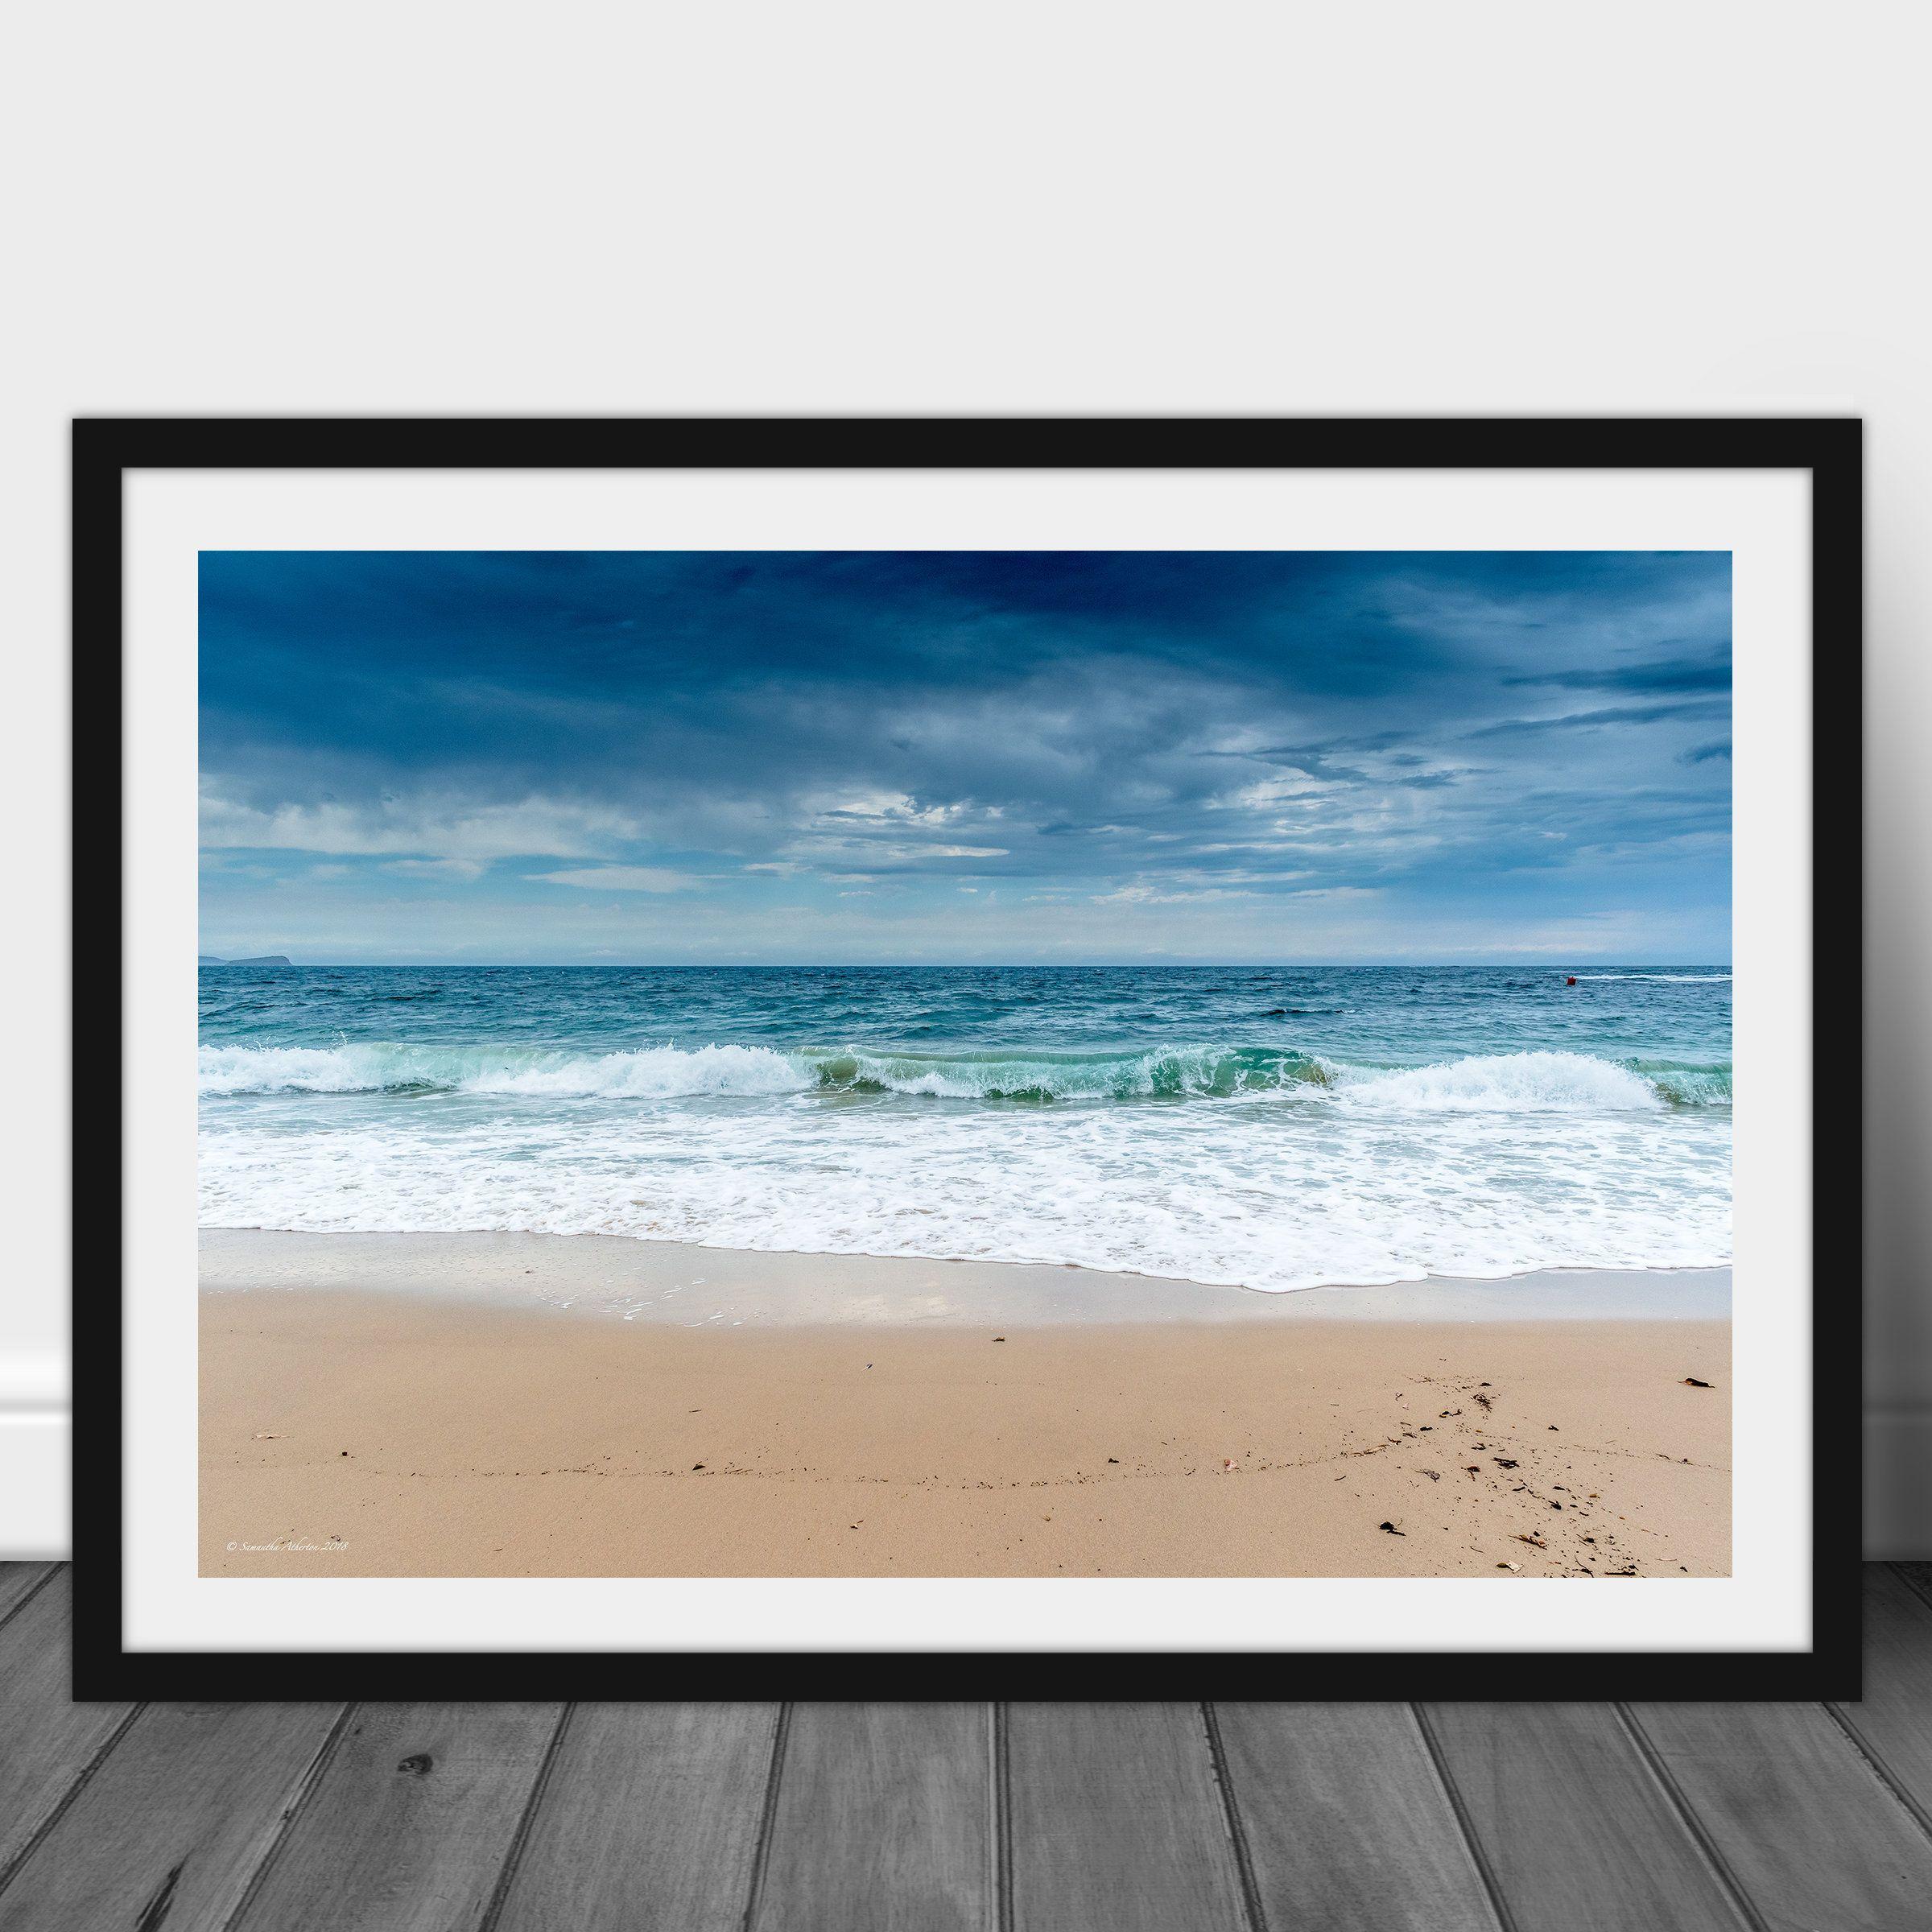 Coastal Wave Beach Print Seascapes Australian Landscape Photography Printable Coastal Decor Beach House Surf Ocean Photography Coastal Beach Decor Landscape Ocean Photography